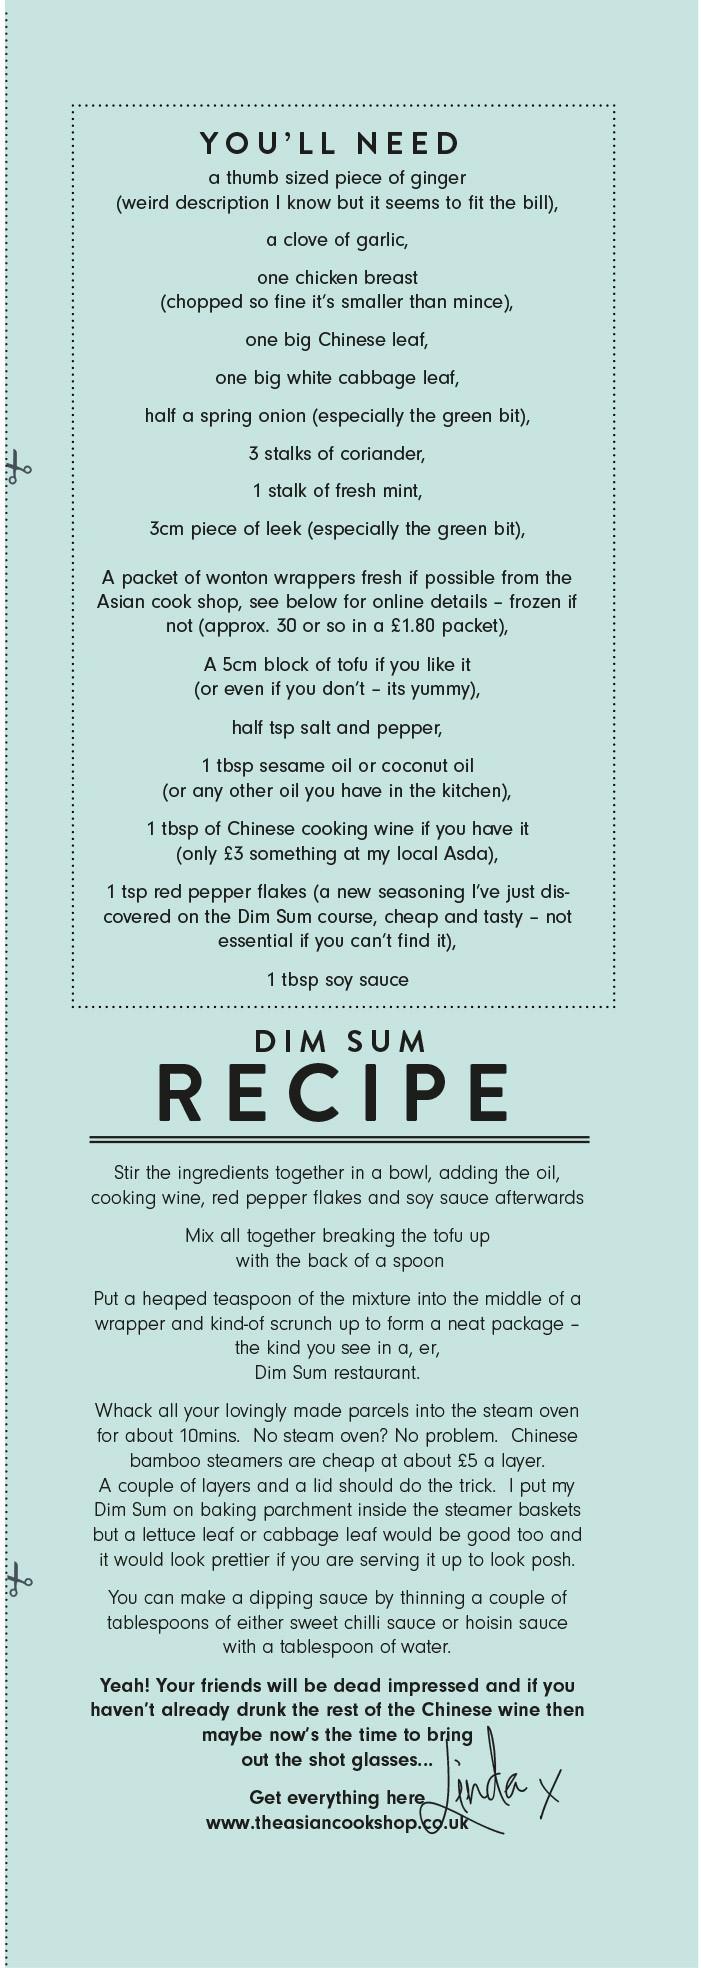 Linda Barker Dim Sum Ingredients Recipe